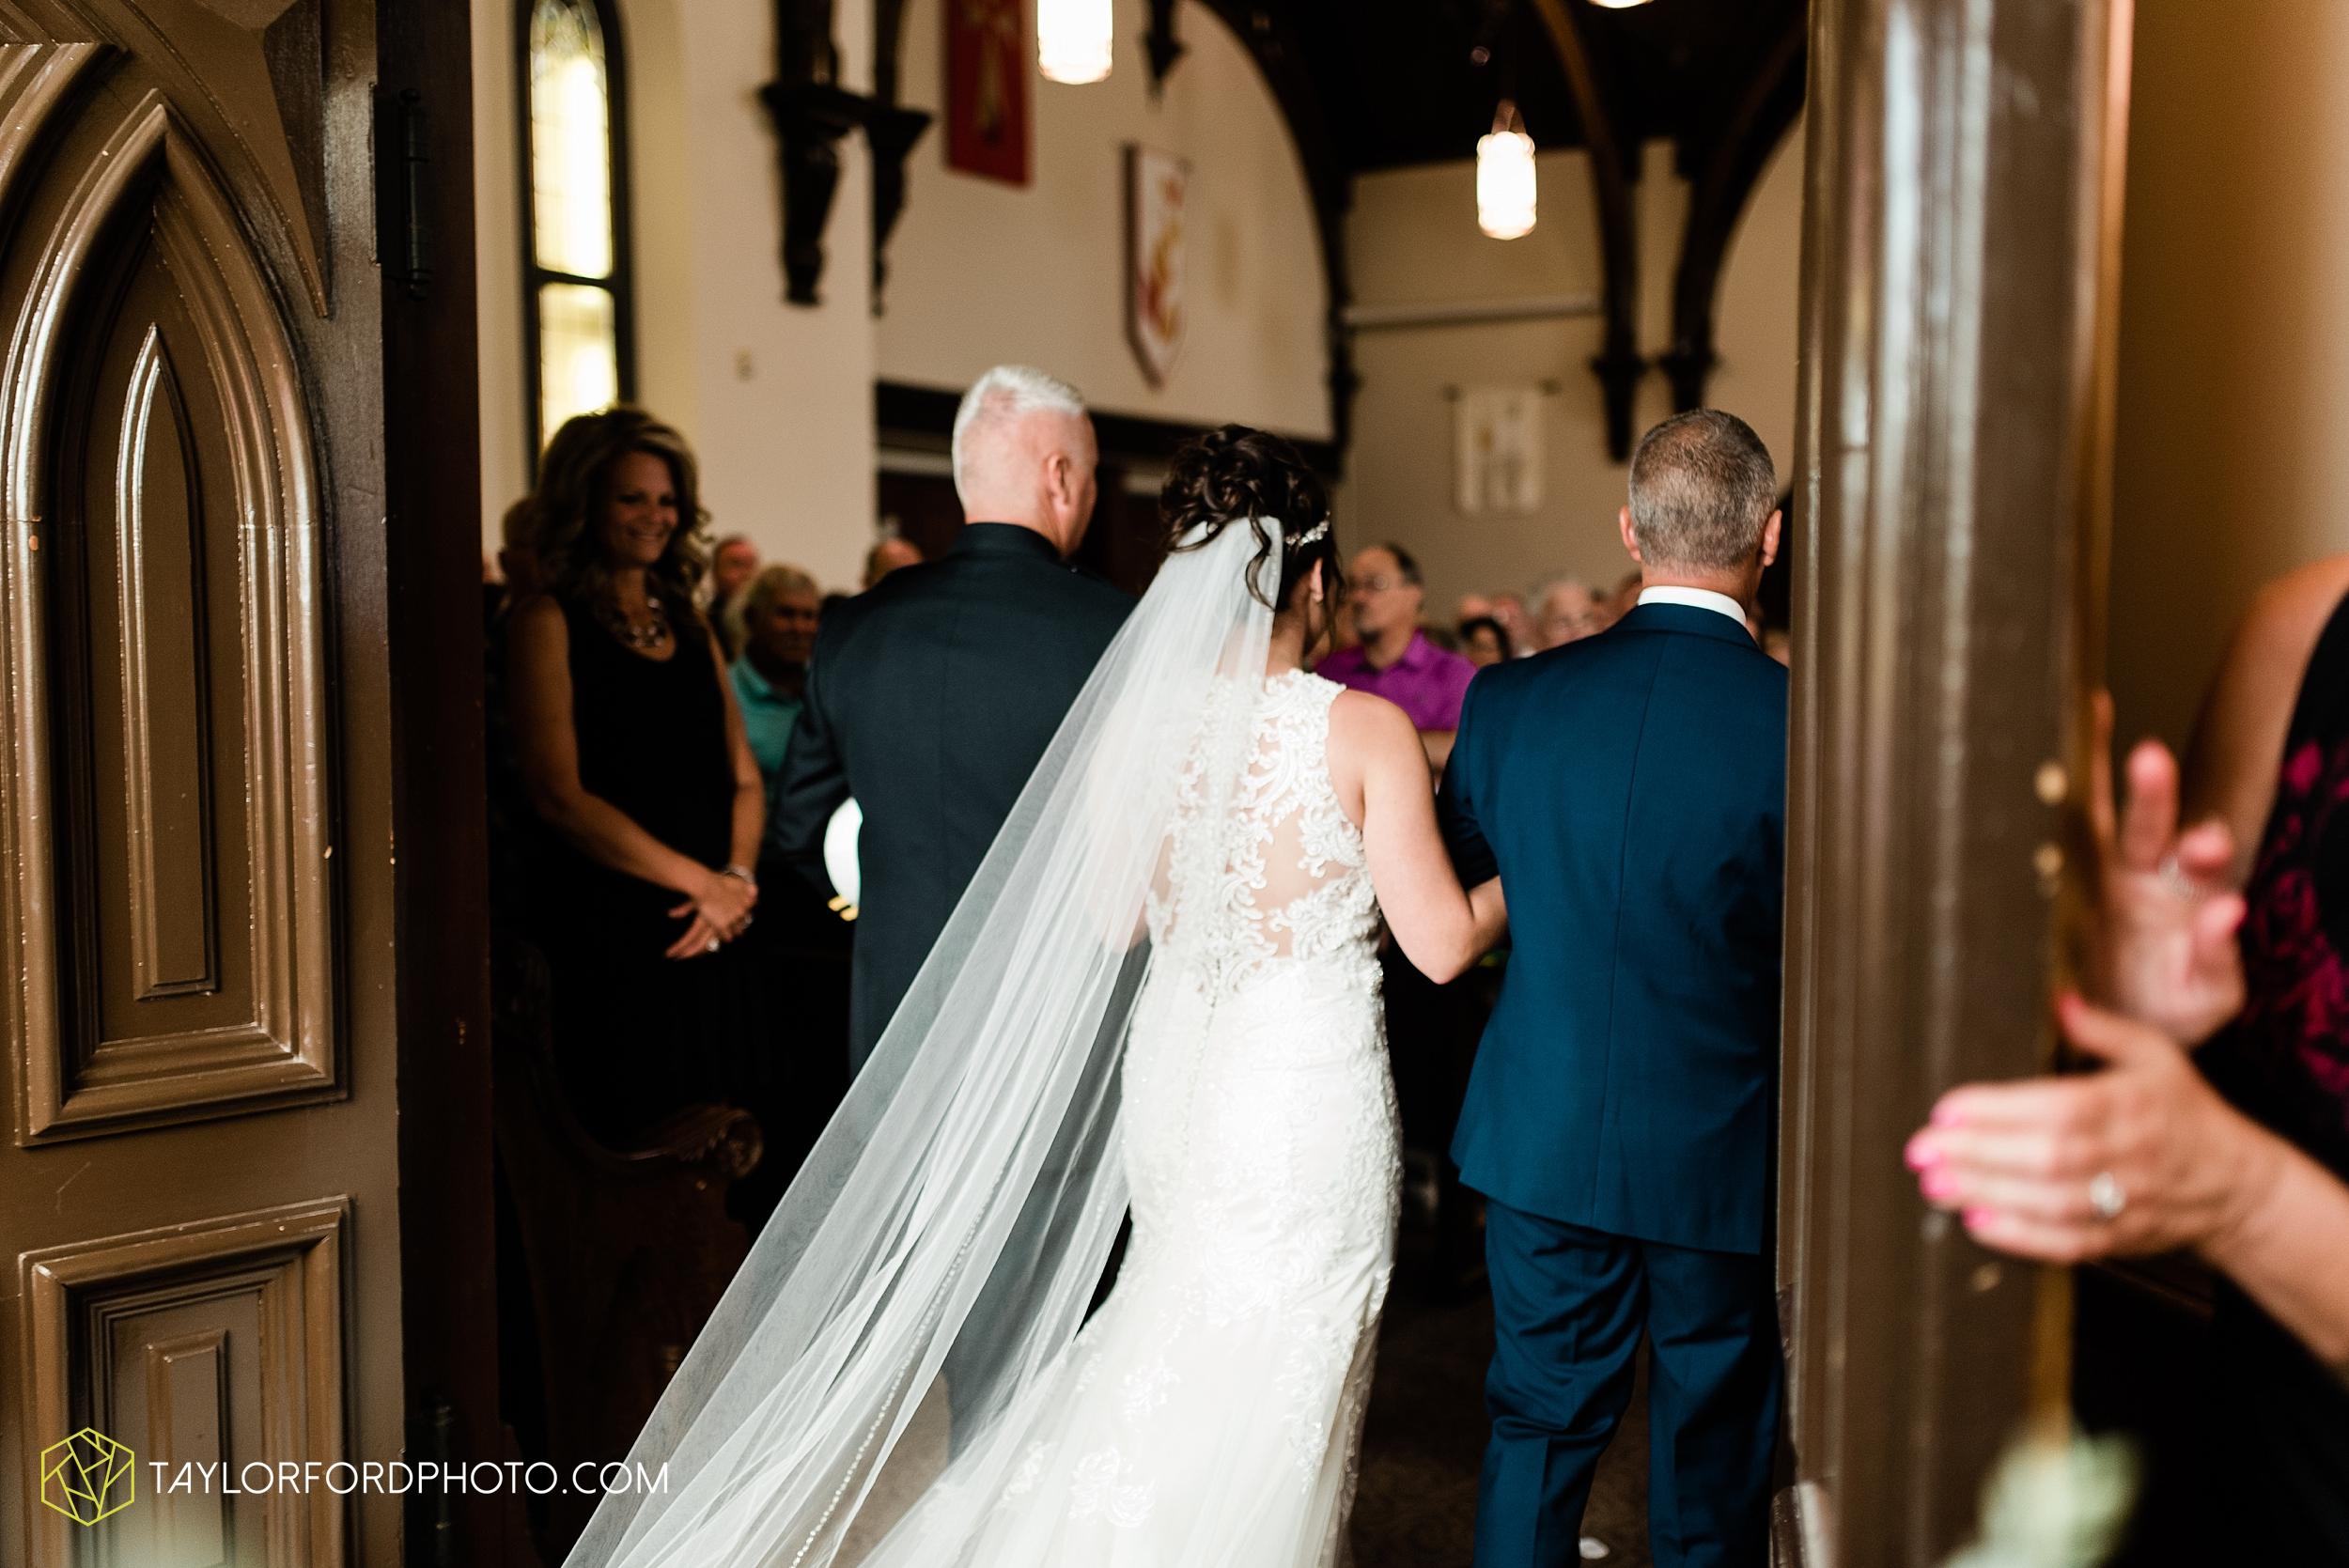 van-wert-ohio-first-united-methodist-church-county-dairy-barn-wedding-photographer-taylor-ford-photography_9827.jpg